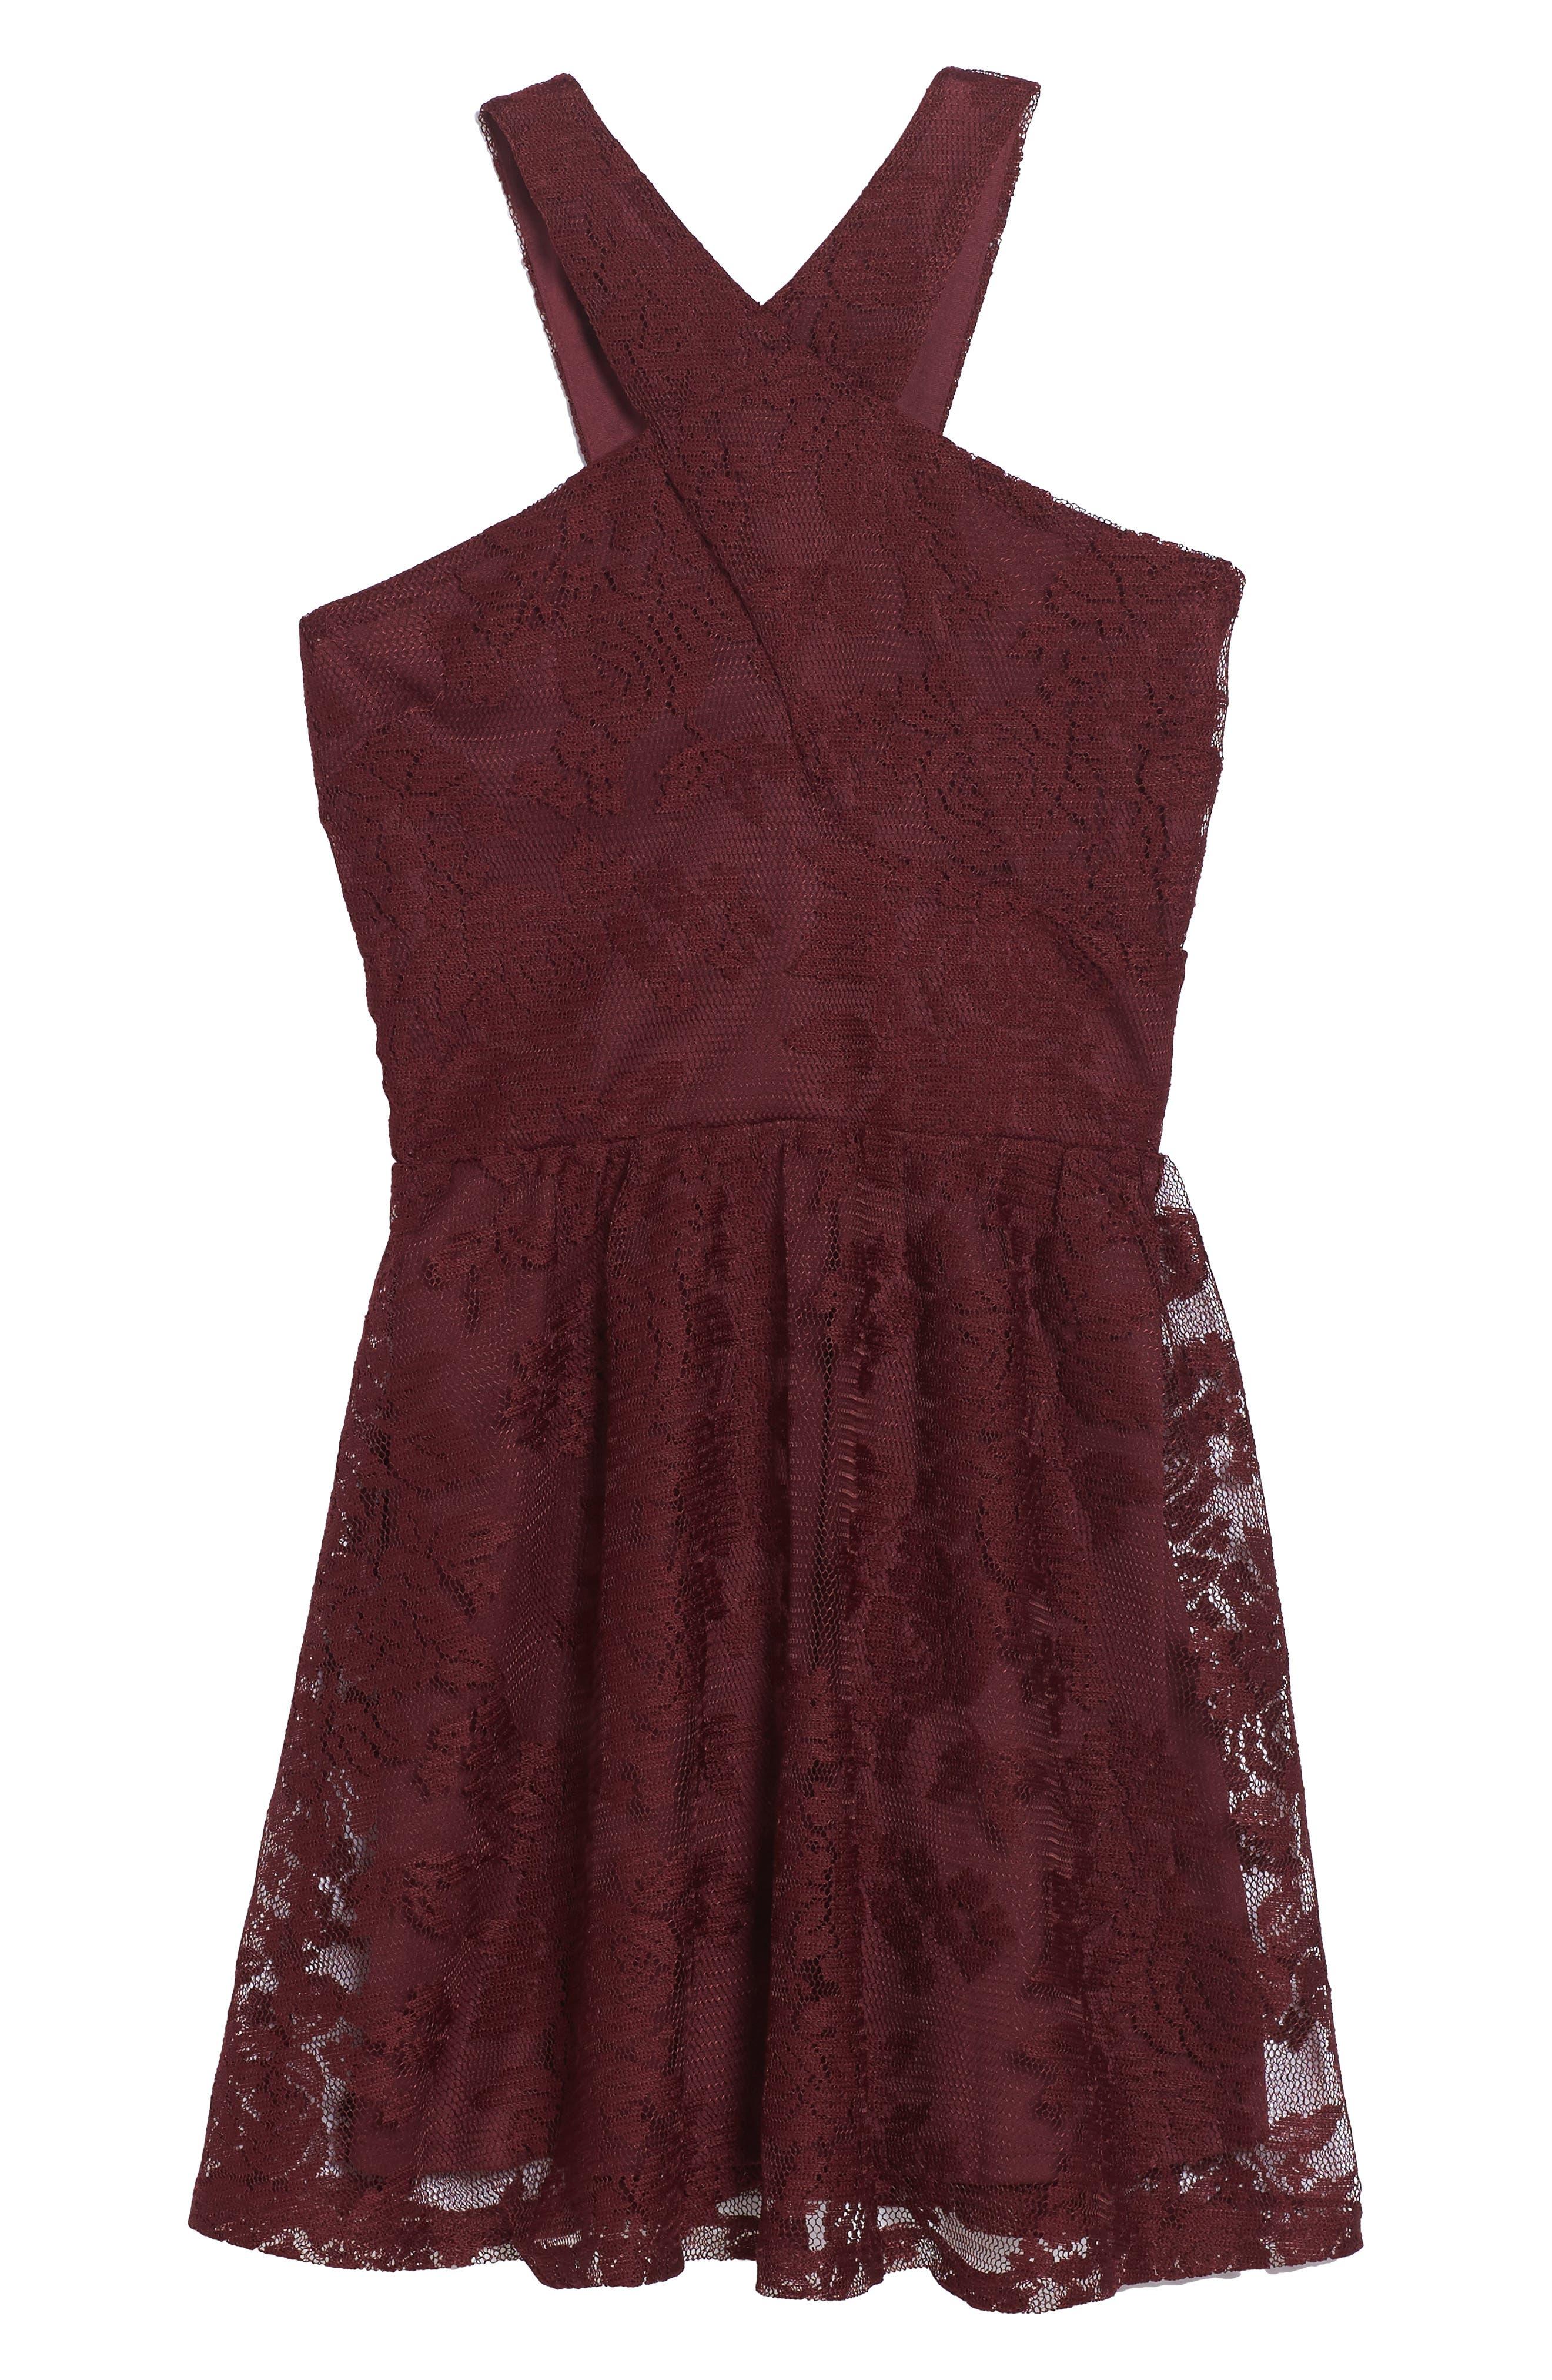 Main Image - Penelope Tree Winona Lace Dress (Big Girls)